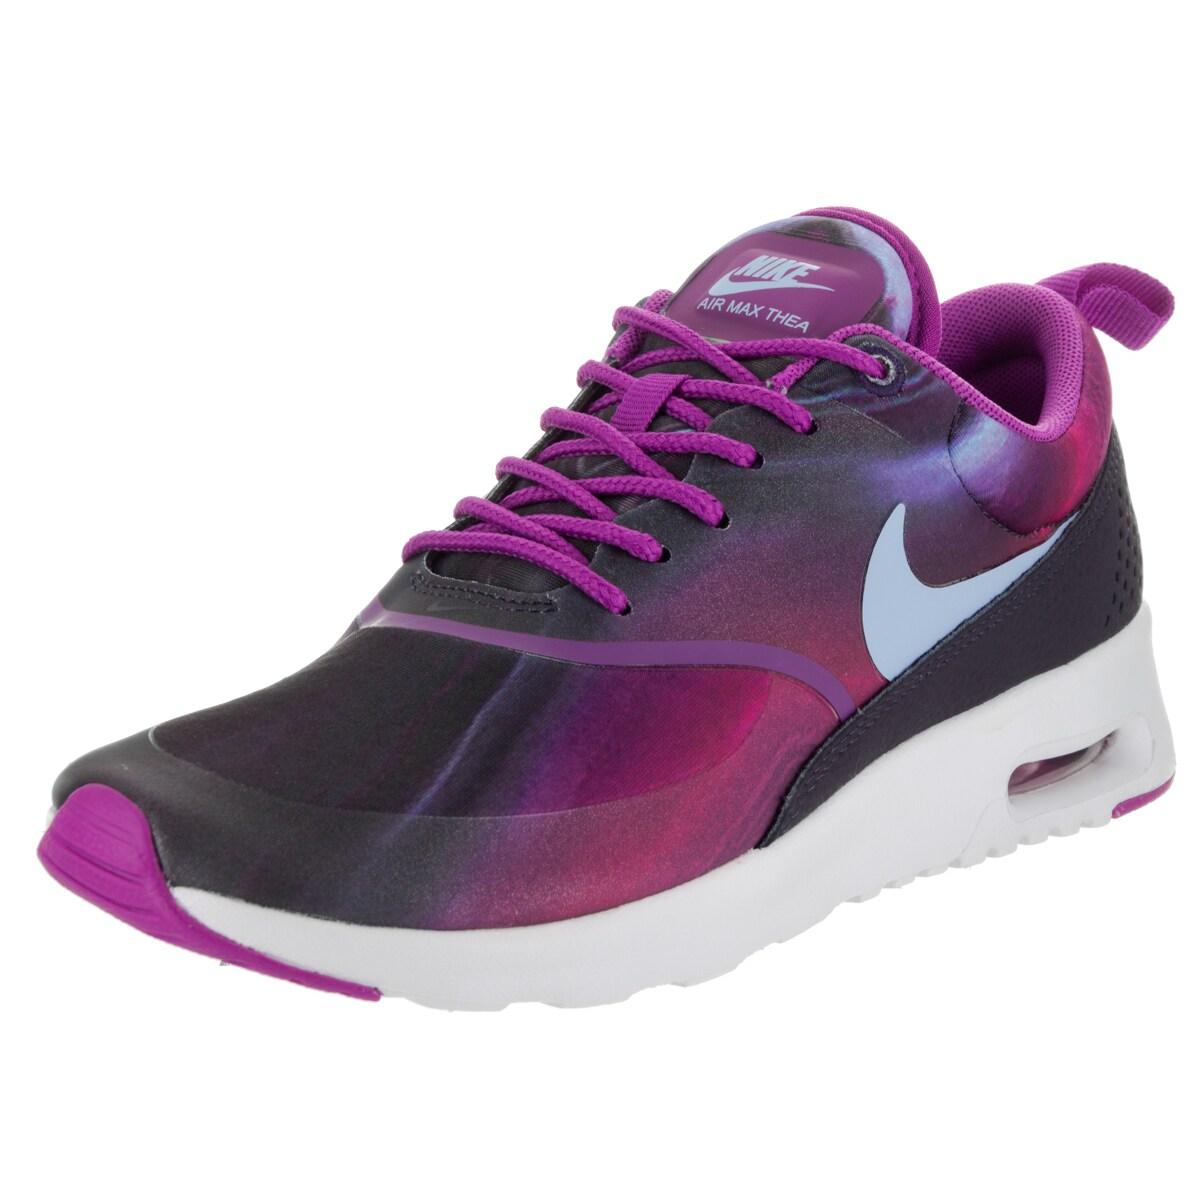 Nike Air Max Thea Print Womens Running Shoes Purple Pink